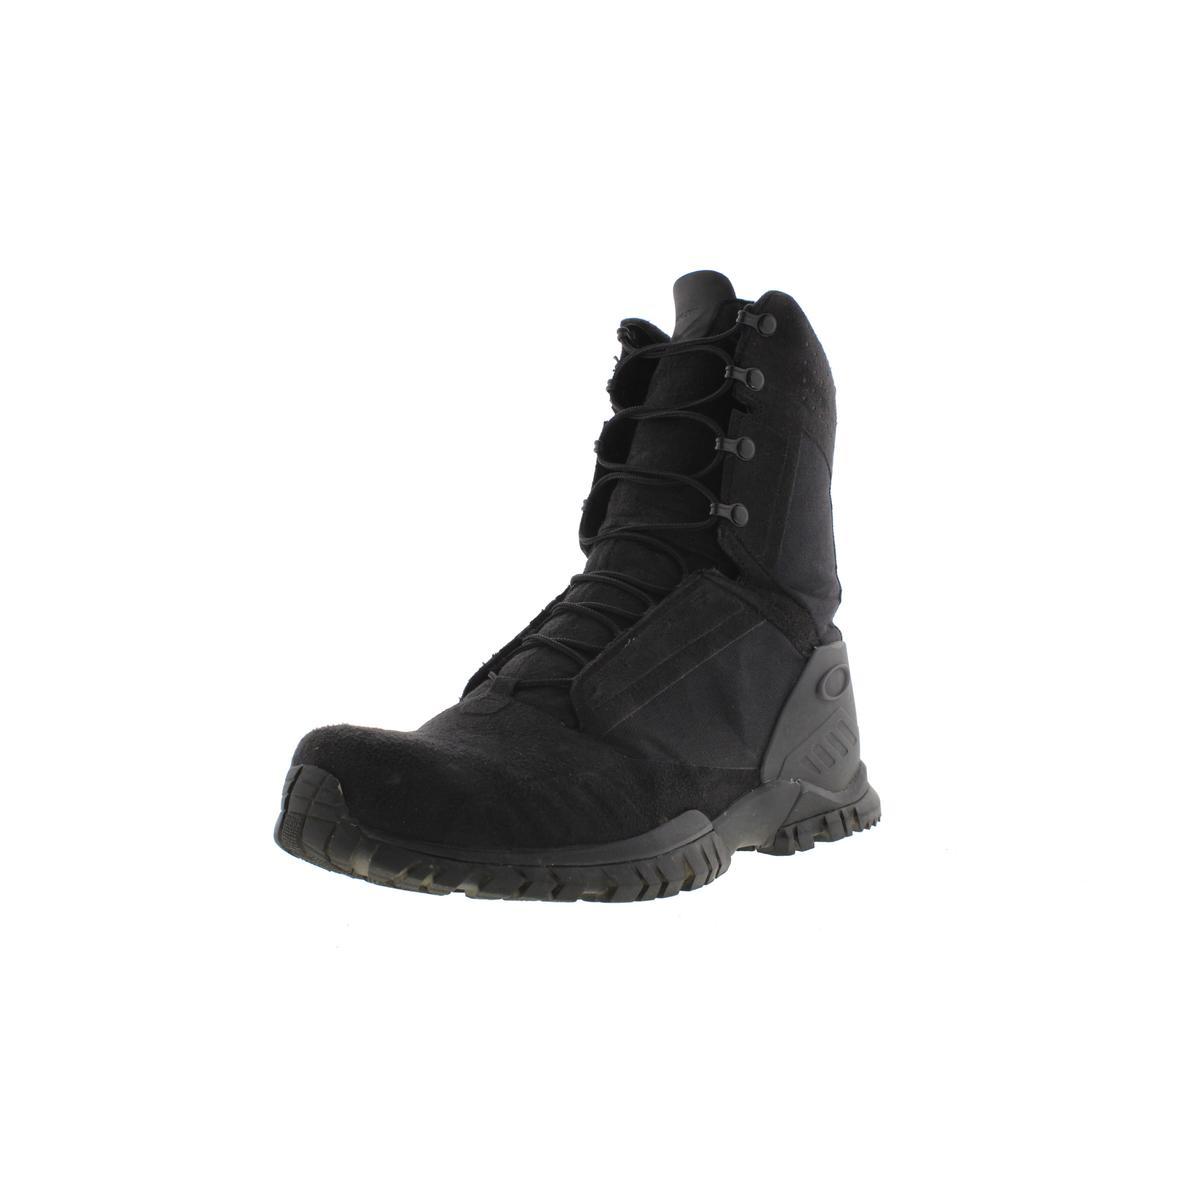 oakley si boots black  oakley 1807 mens si 8